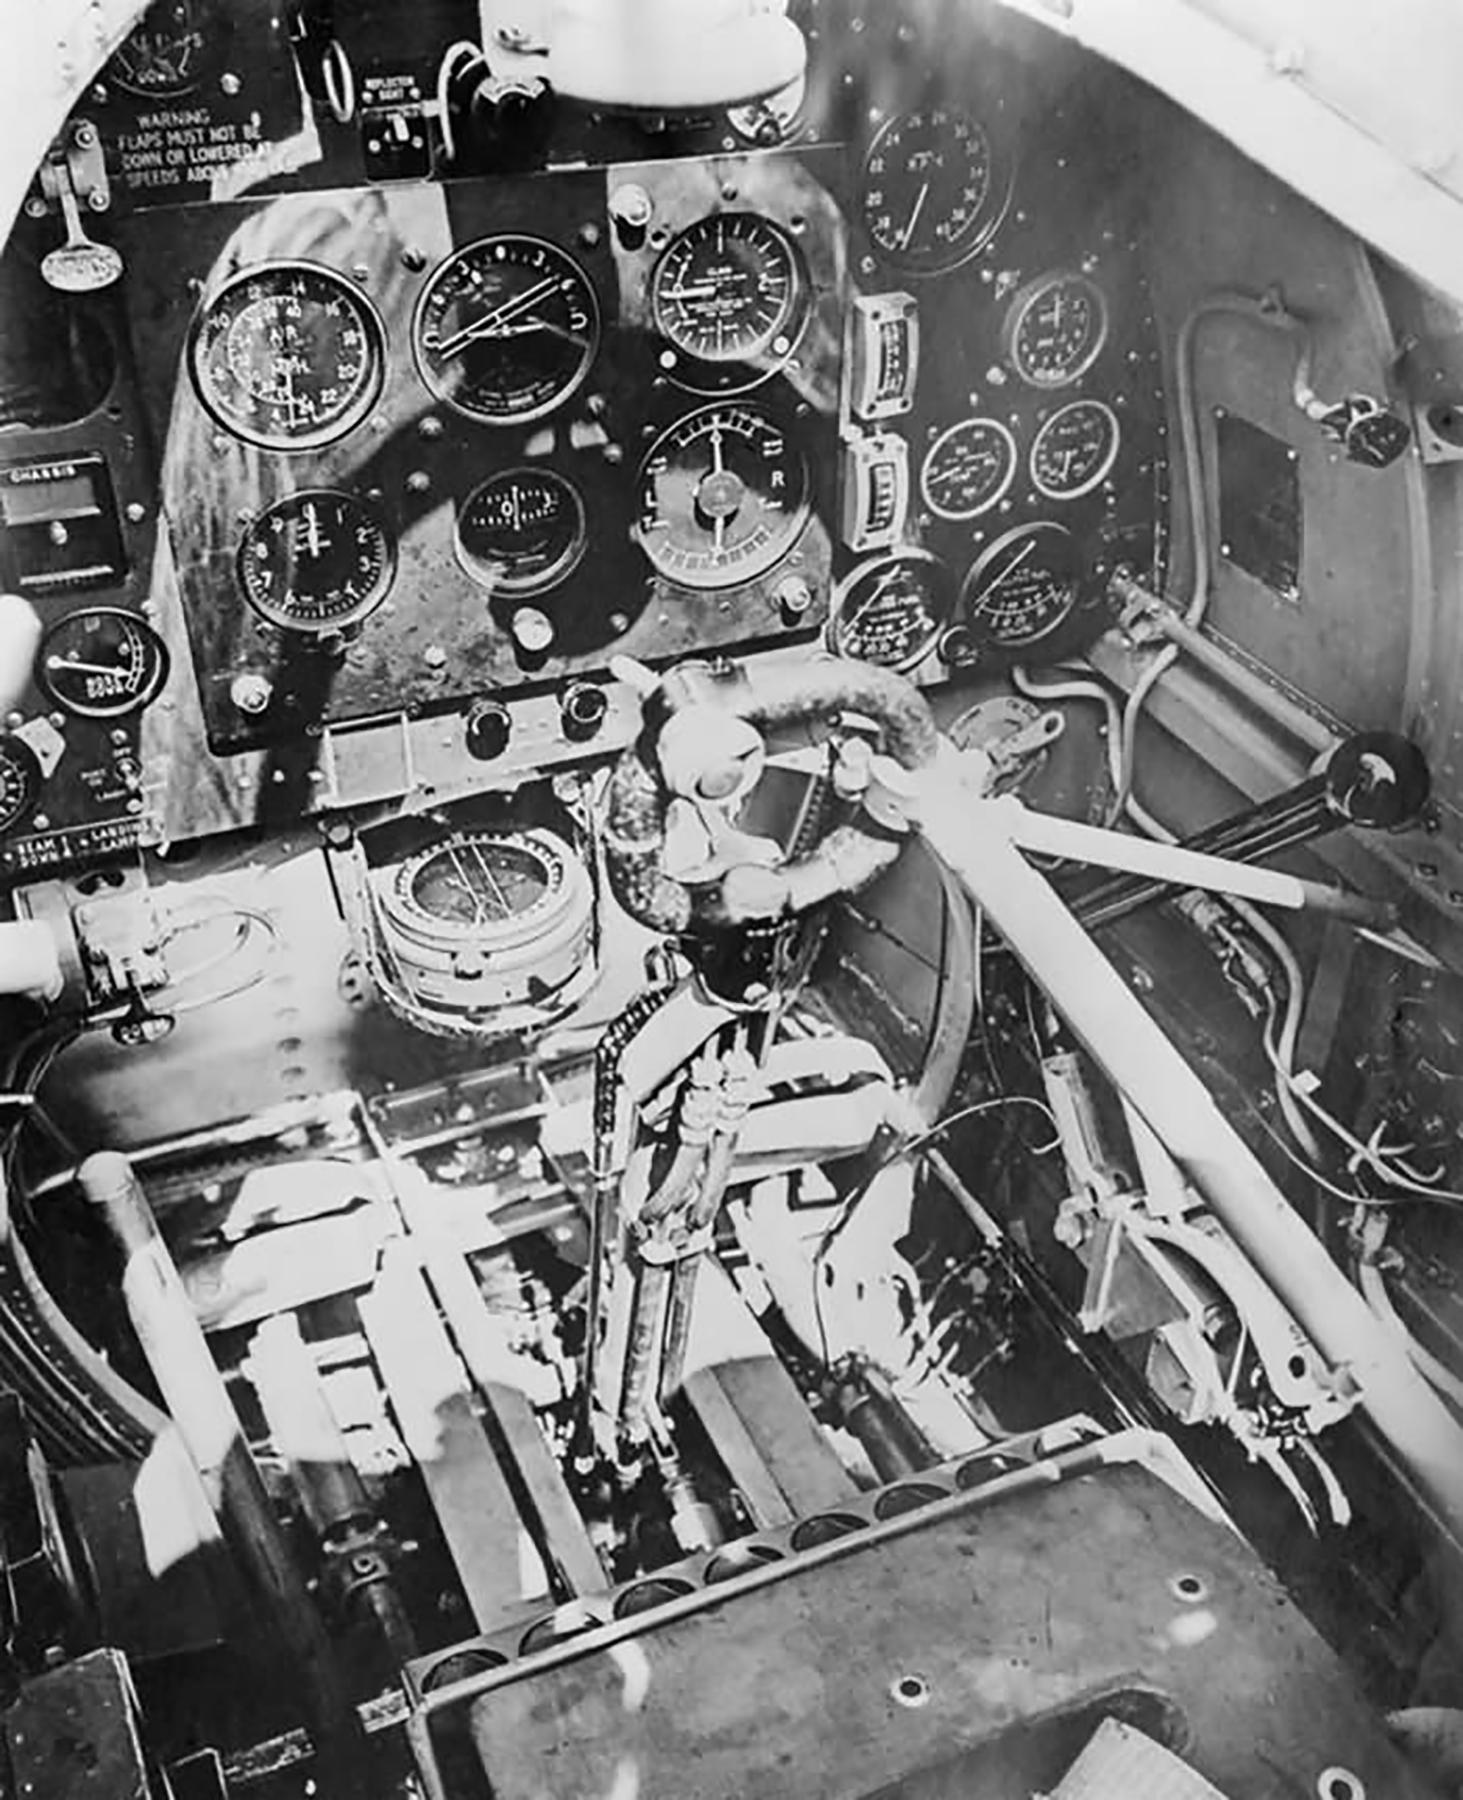 Factory fresh Spitfire Mk IIa cockpit England 1941 web 03